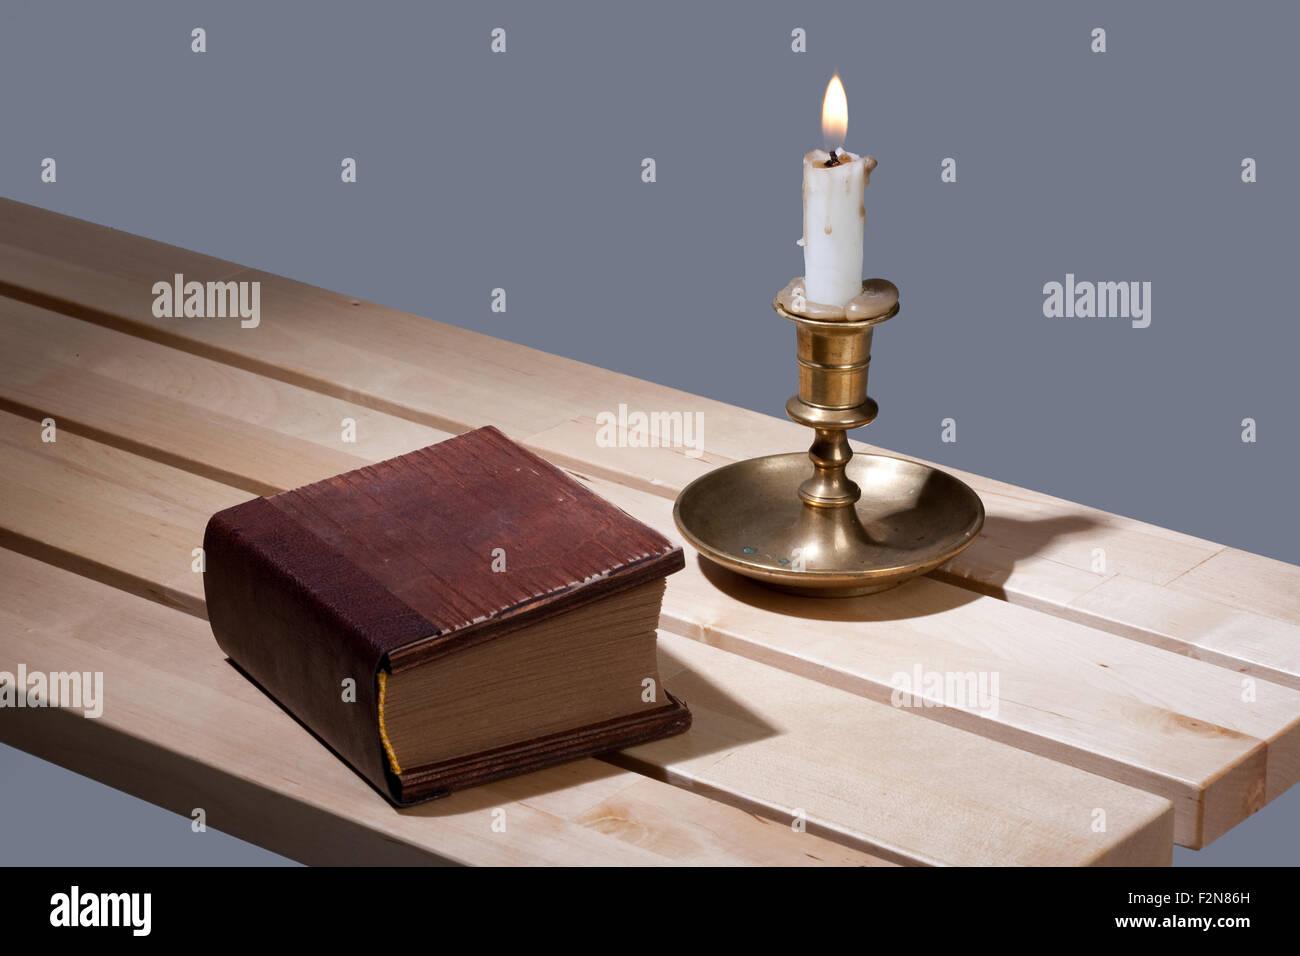 Buch Kerze Kerze Retro-alte Objekt Stillleben Bank Holzoberfläche braun Feuer Flamme Kupfer Bronze antik altes Stockbild